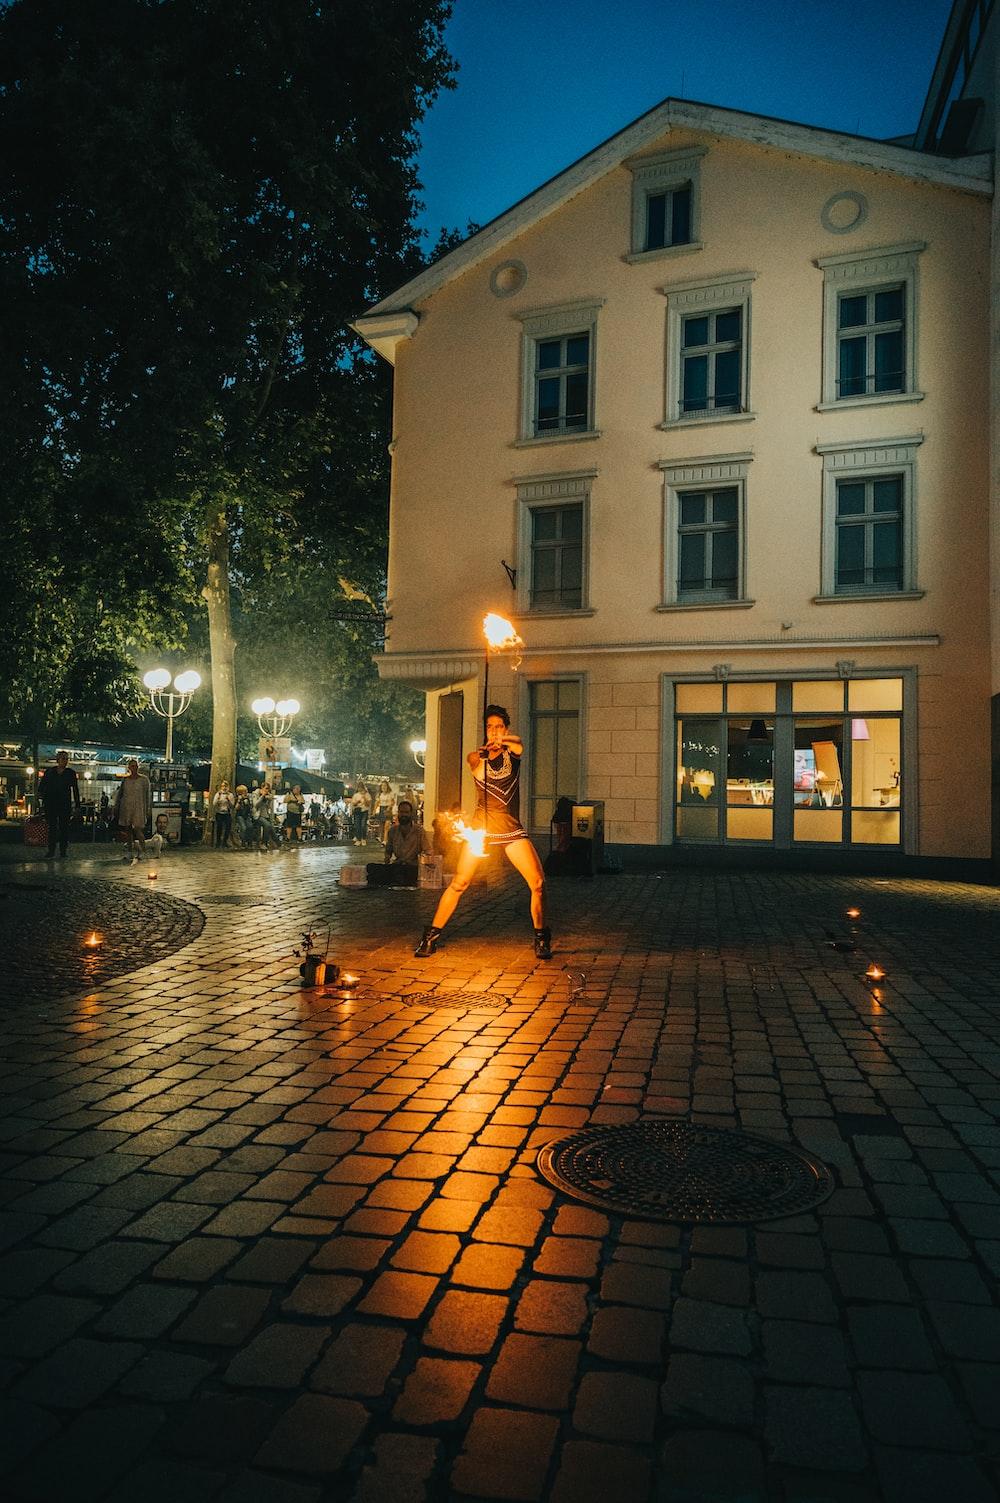 woman in black dress walking on sidewalk during night time